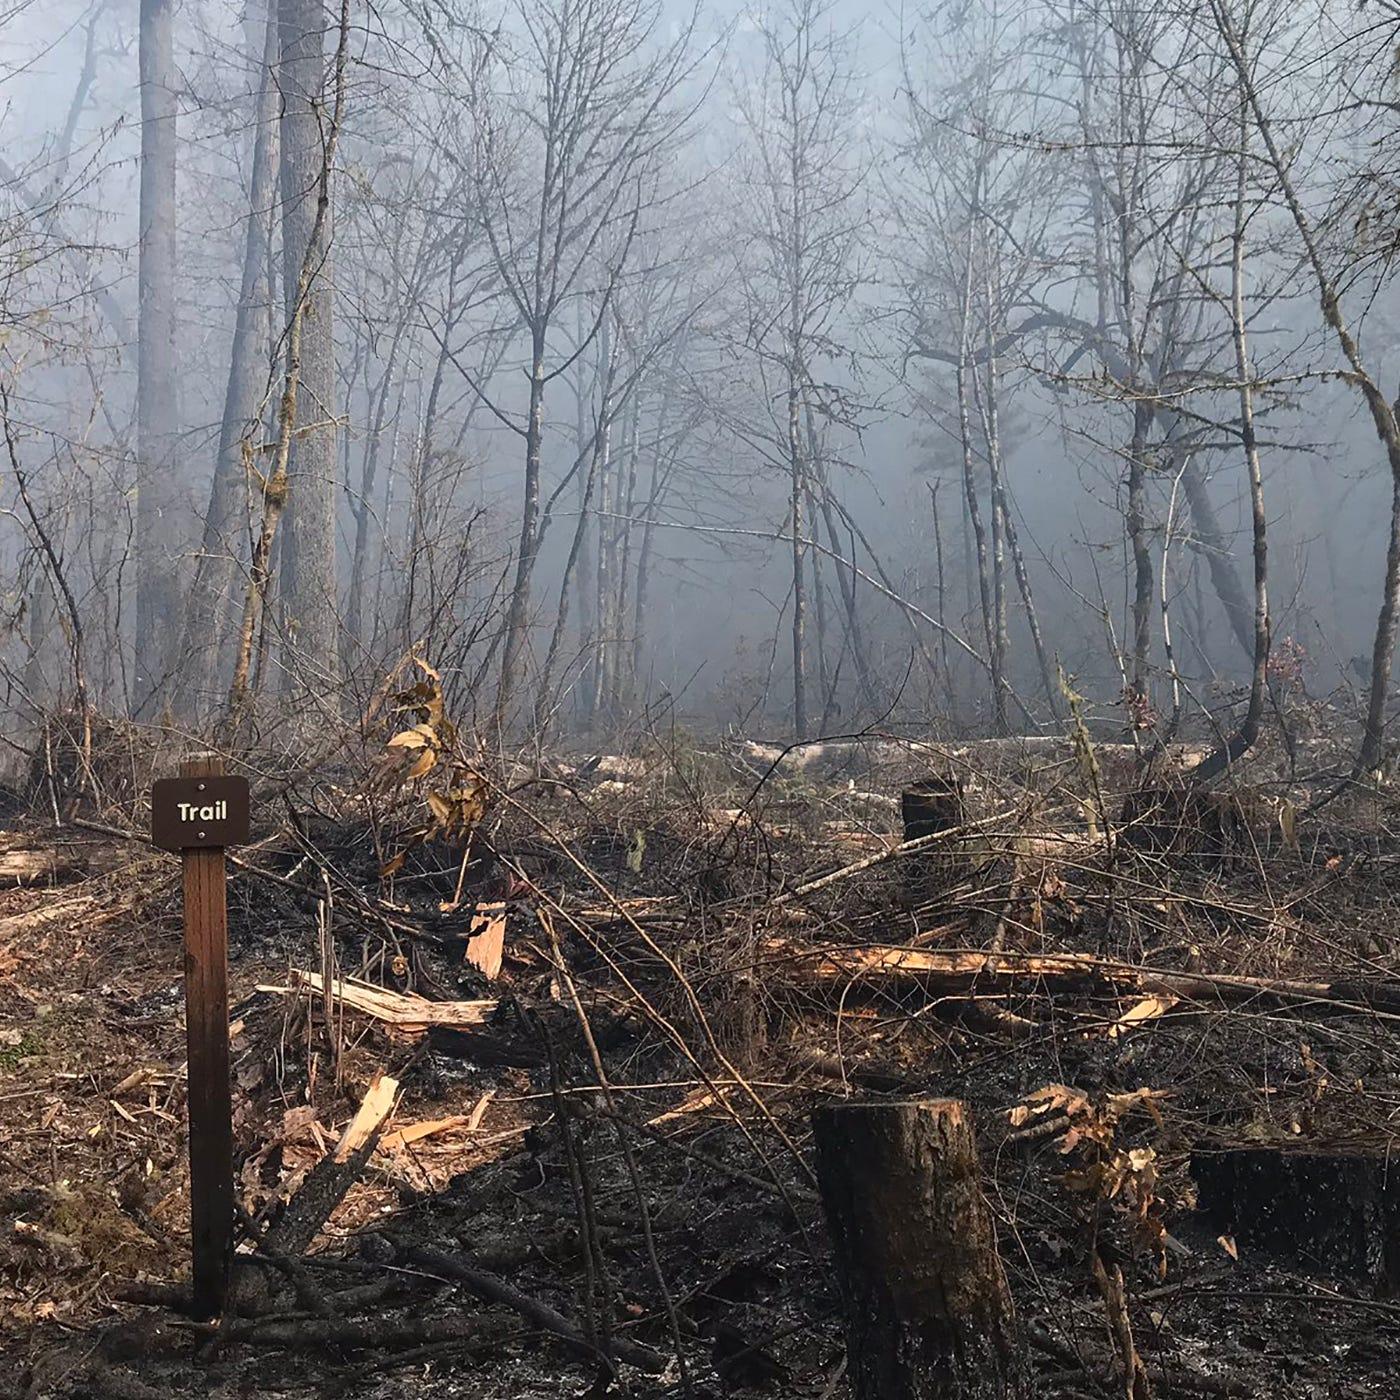 Santiam Park Fire: Burn ban issued in Marion, Clackamas, Linn counties